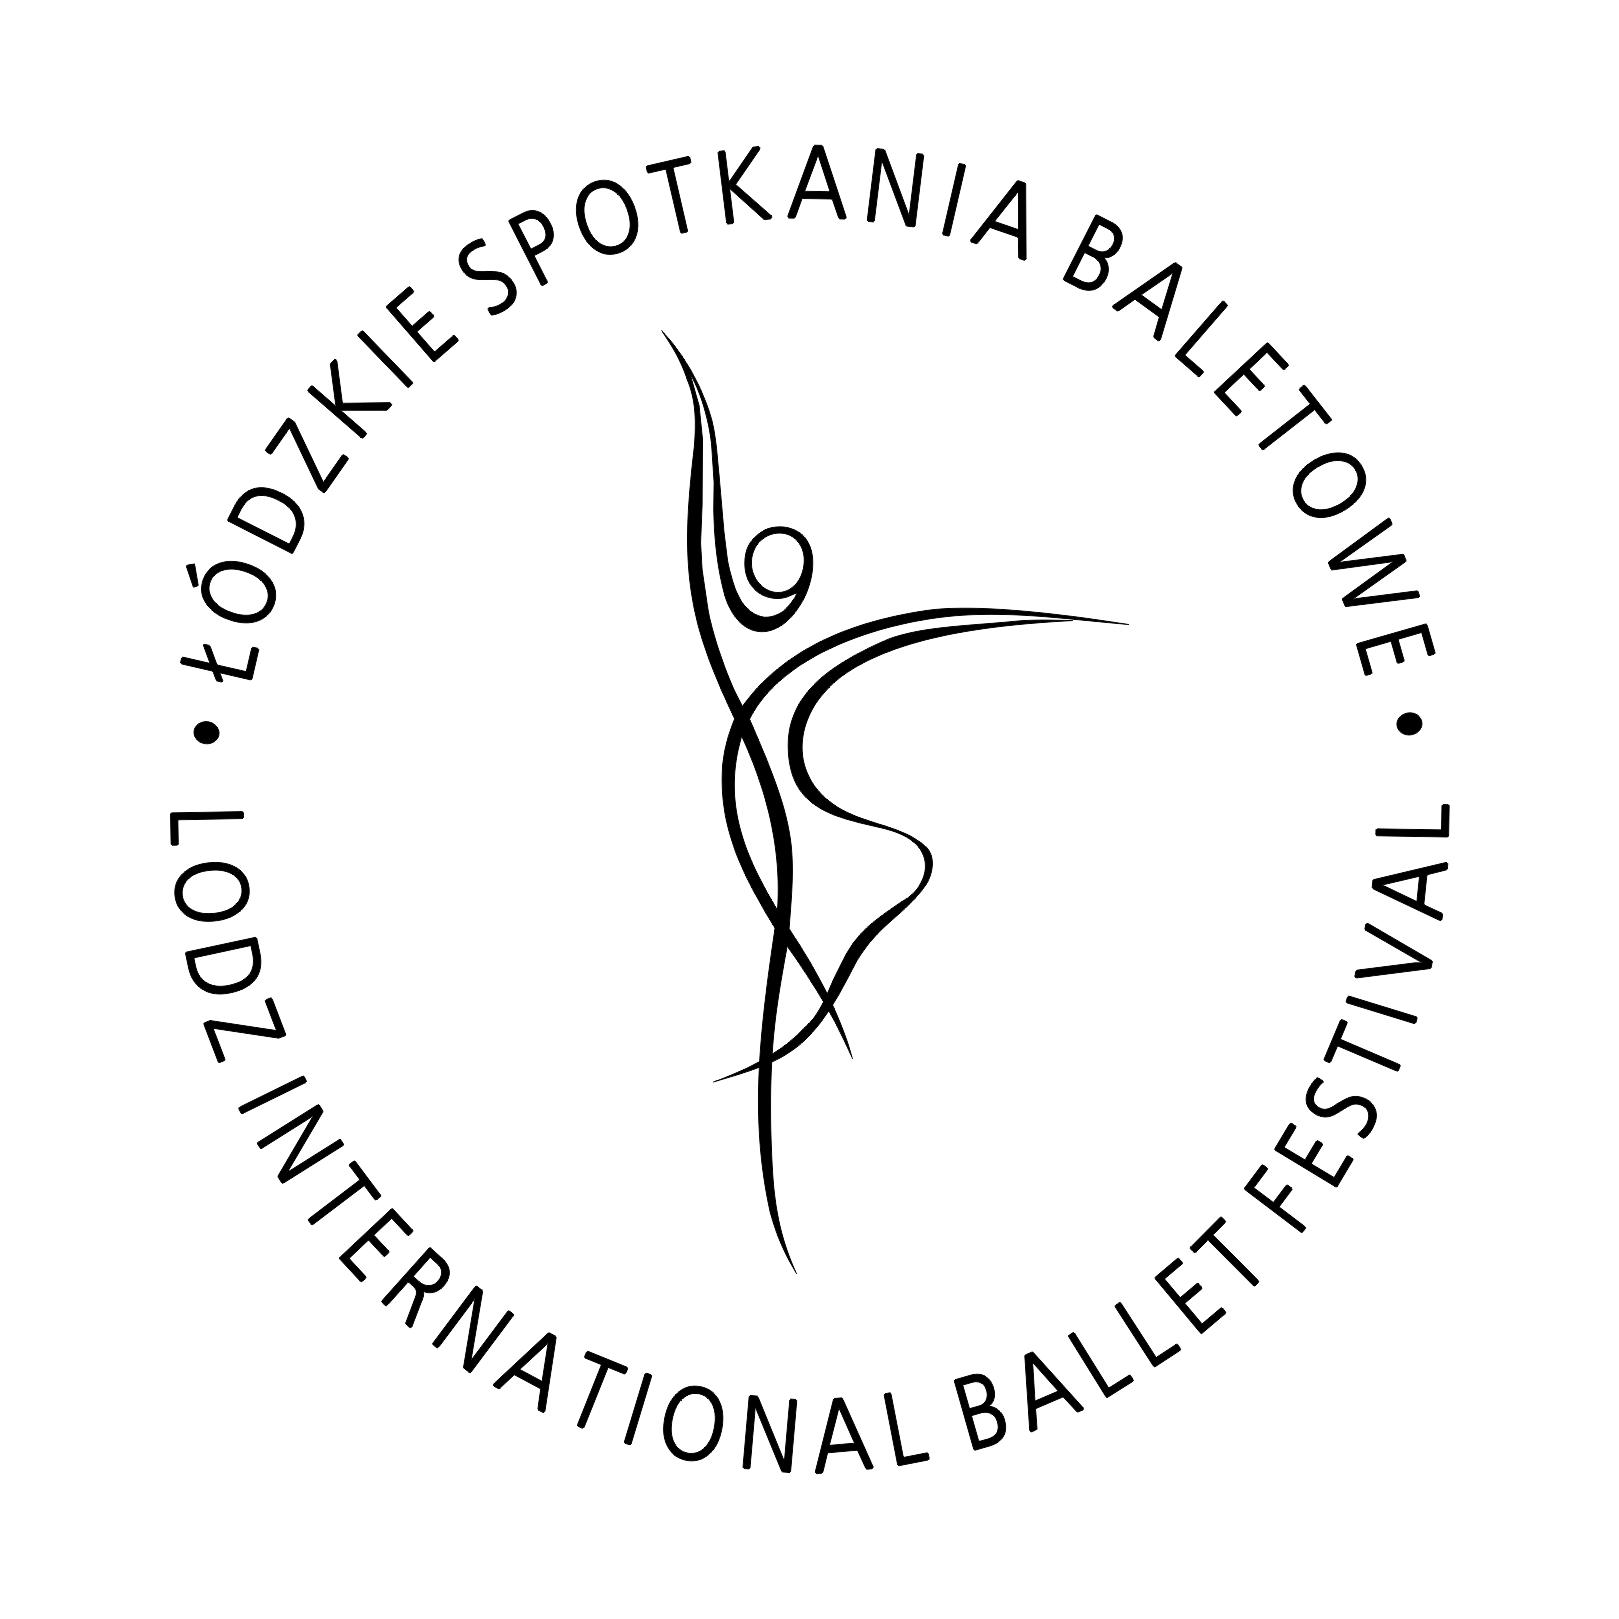 [:pl]Festiwal Łódzkie Spotkania Baletowe[:de]Das Festival Lodzer Ballett-Treffen[:en]Lodz Ballet Festival[:ru]Фестиваль Лодзинские балетные встречи[:]